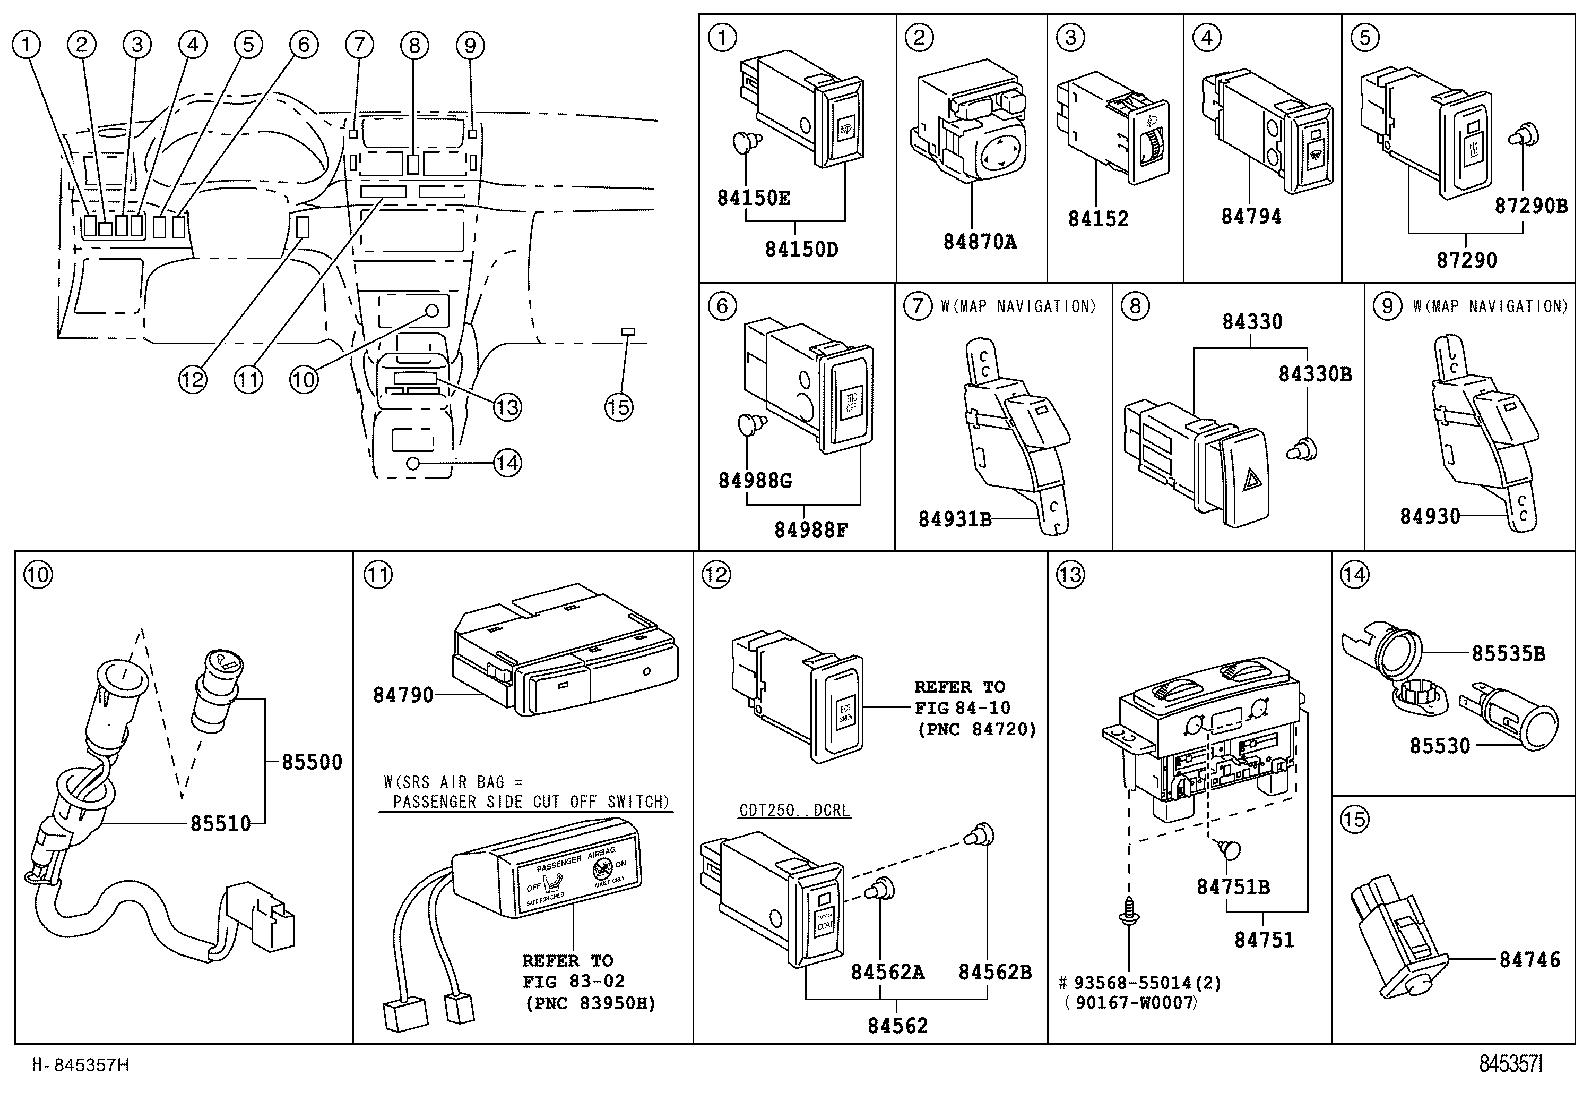 toyota avensisadt250l-aefeyw - electrical